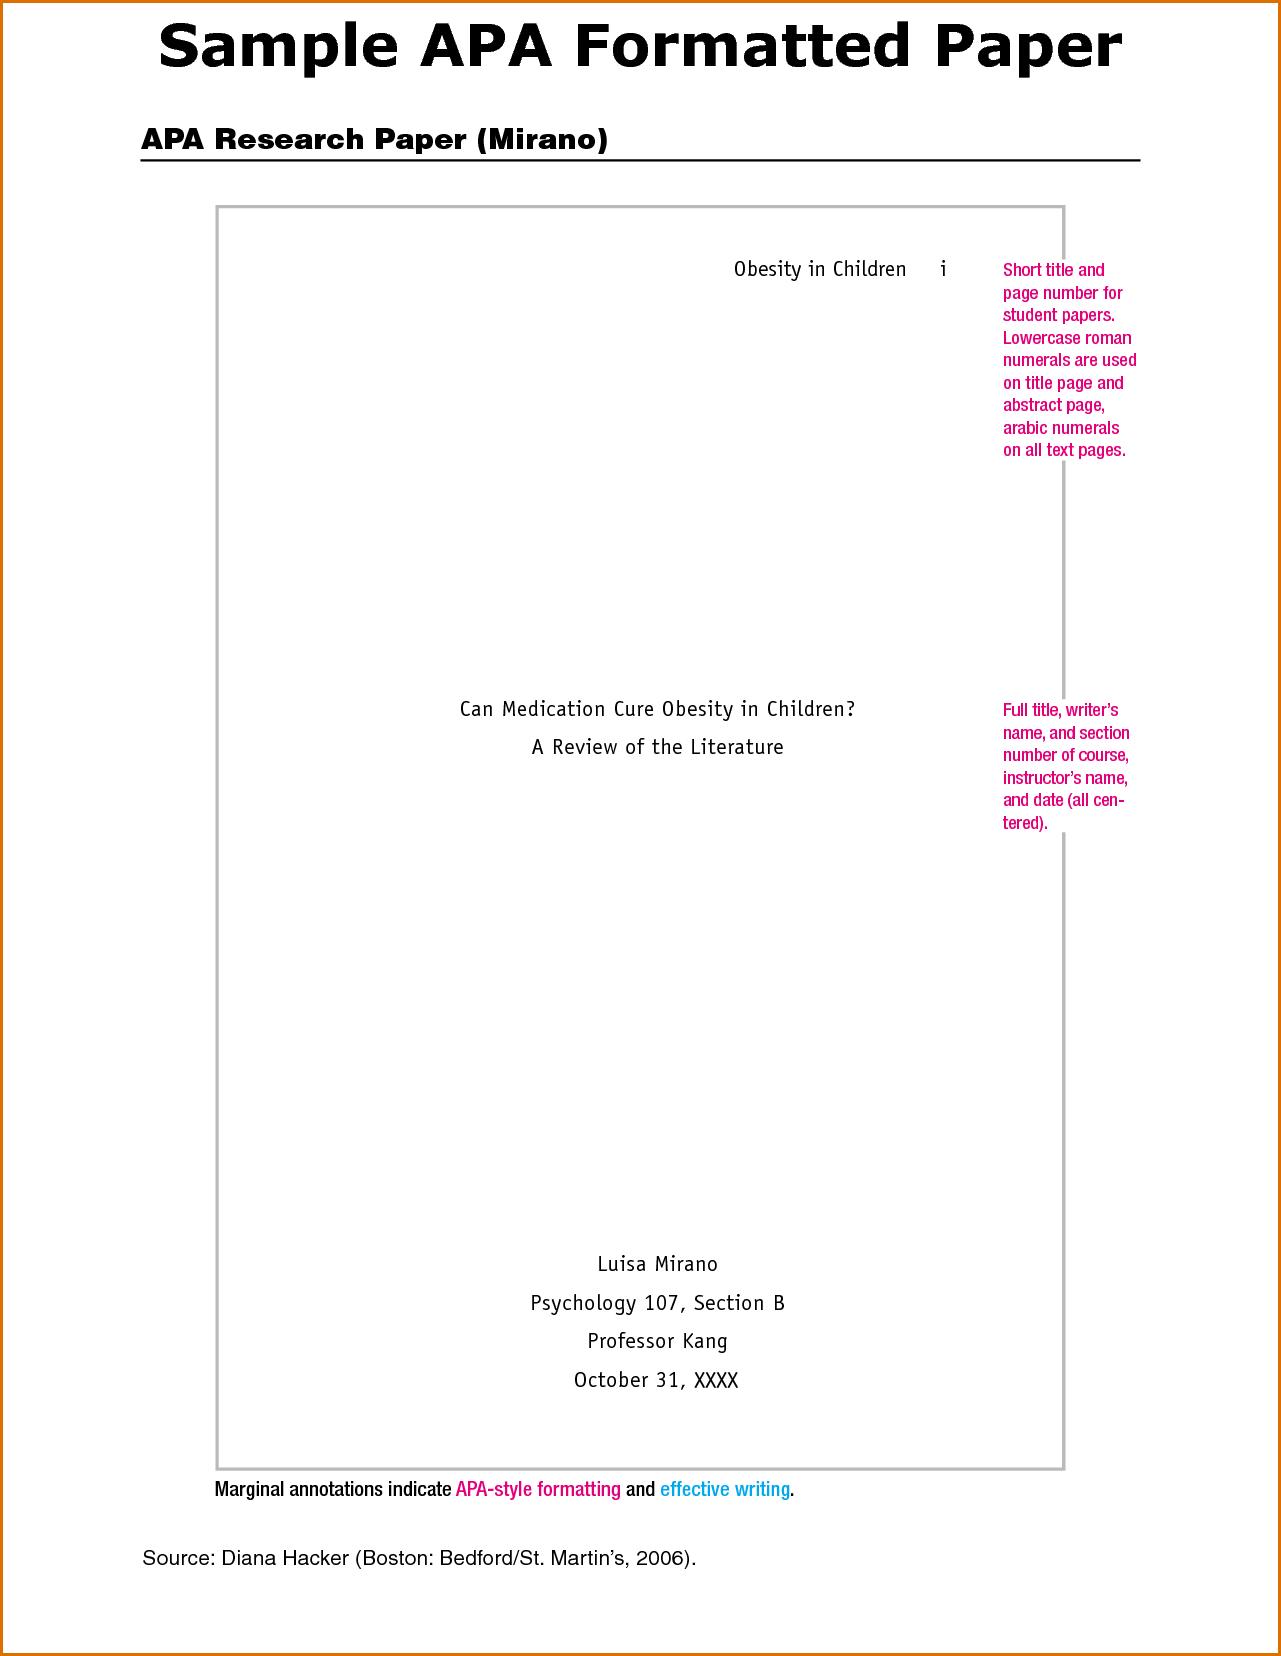 006 Apa Paper Template Iztn6rys Essay Example Stupendous Format Title Page Sample Pdf 2017 Full